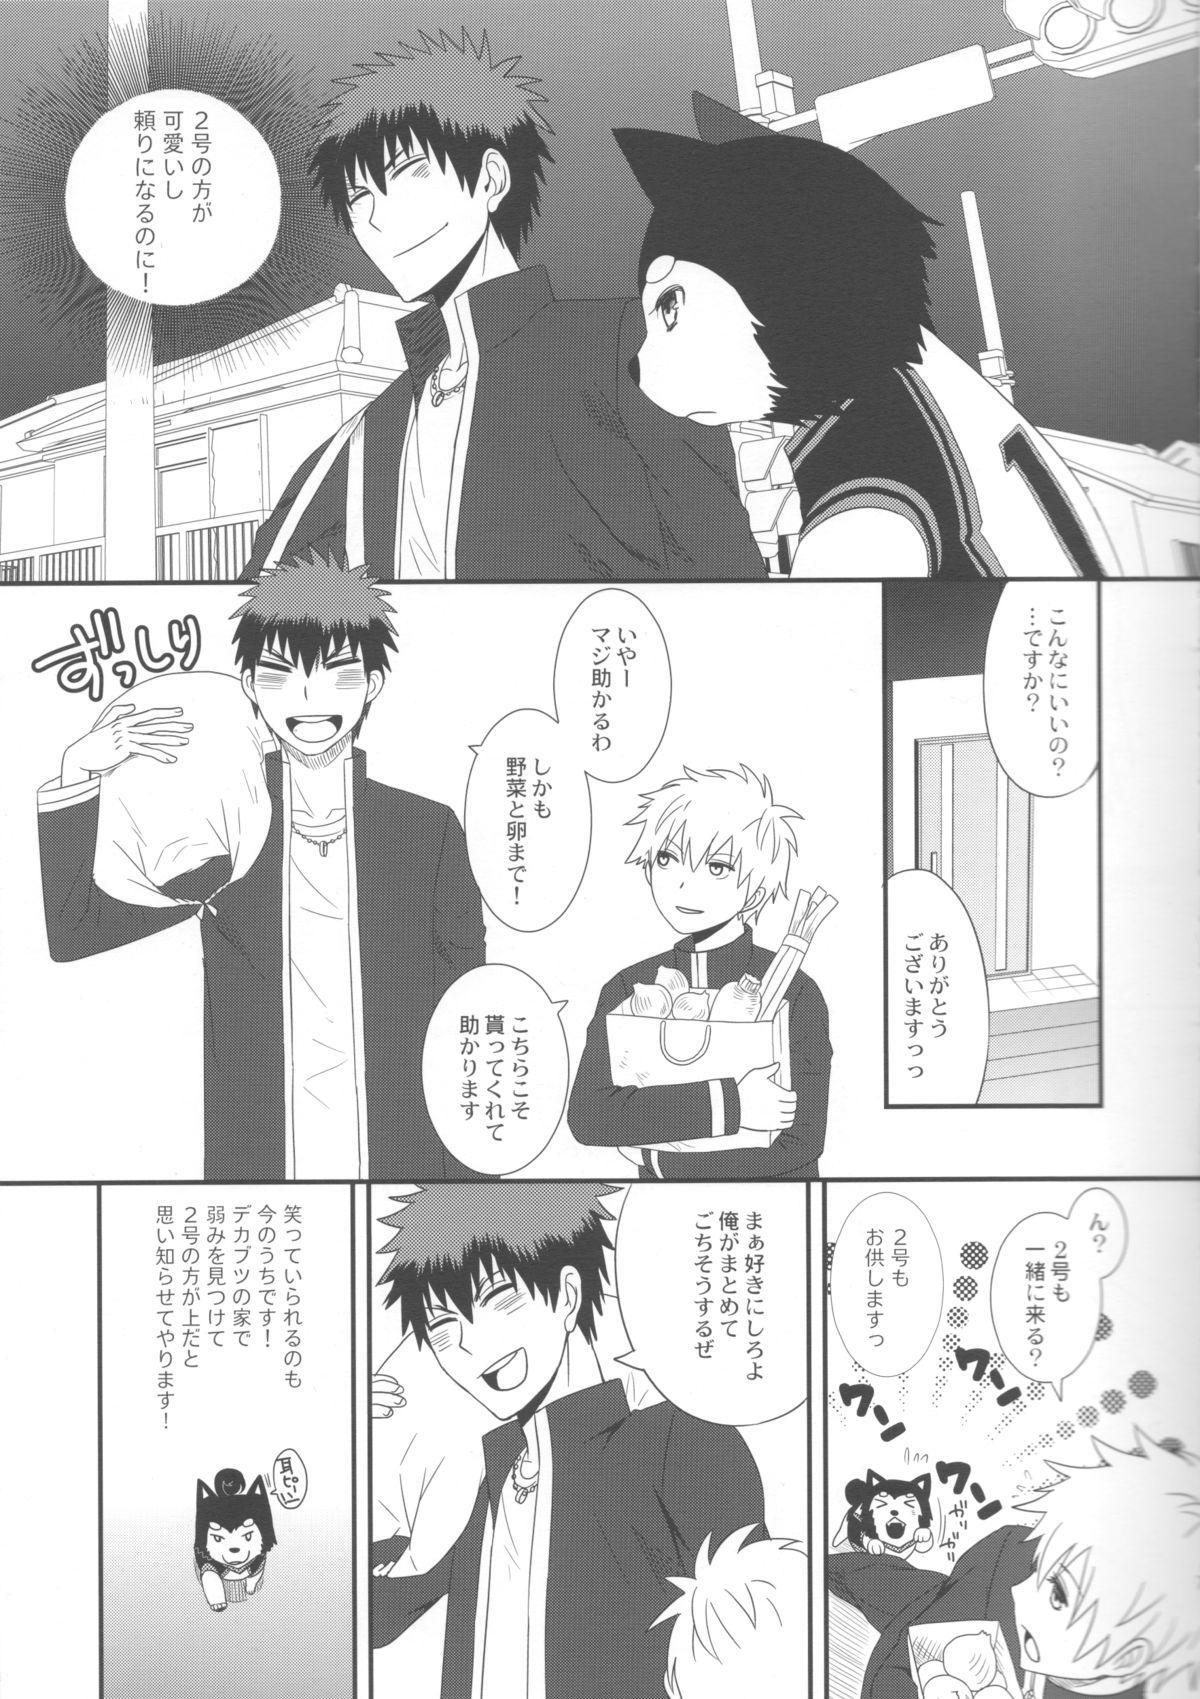 Kuroko to Kagami to Tokidoki Nigou to 5